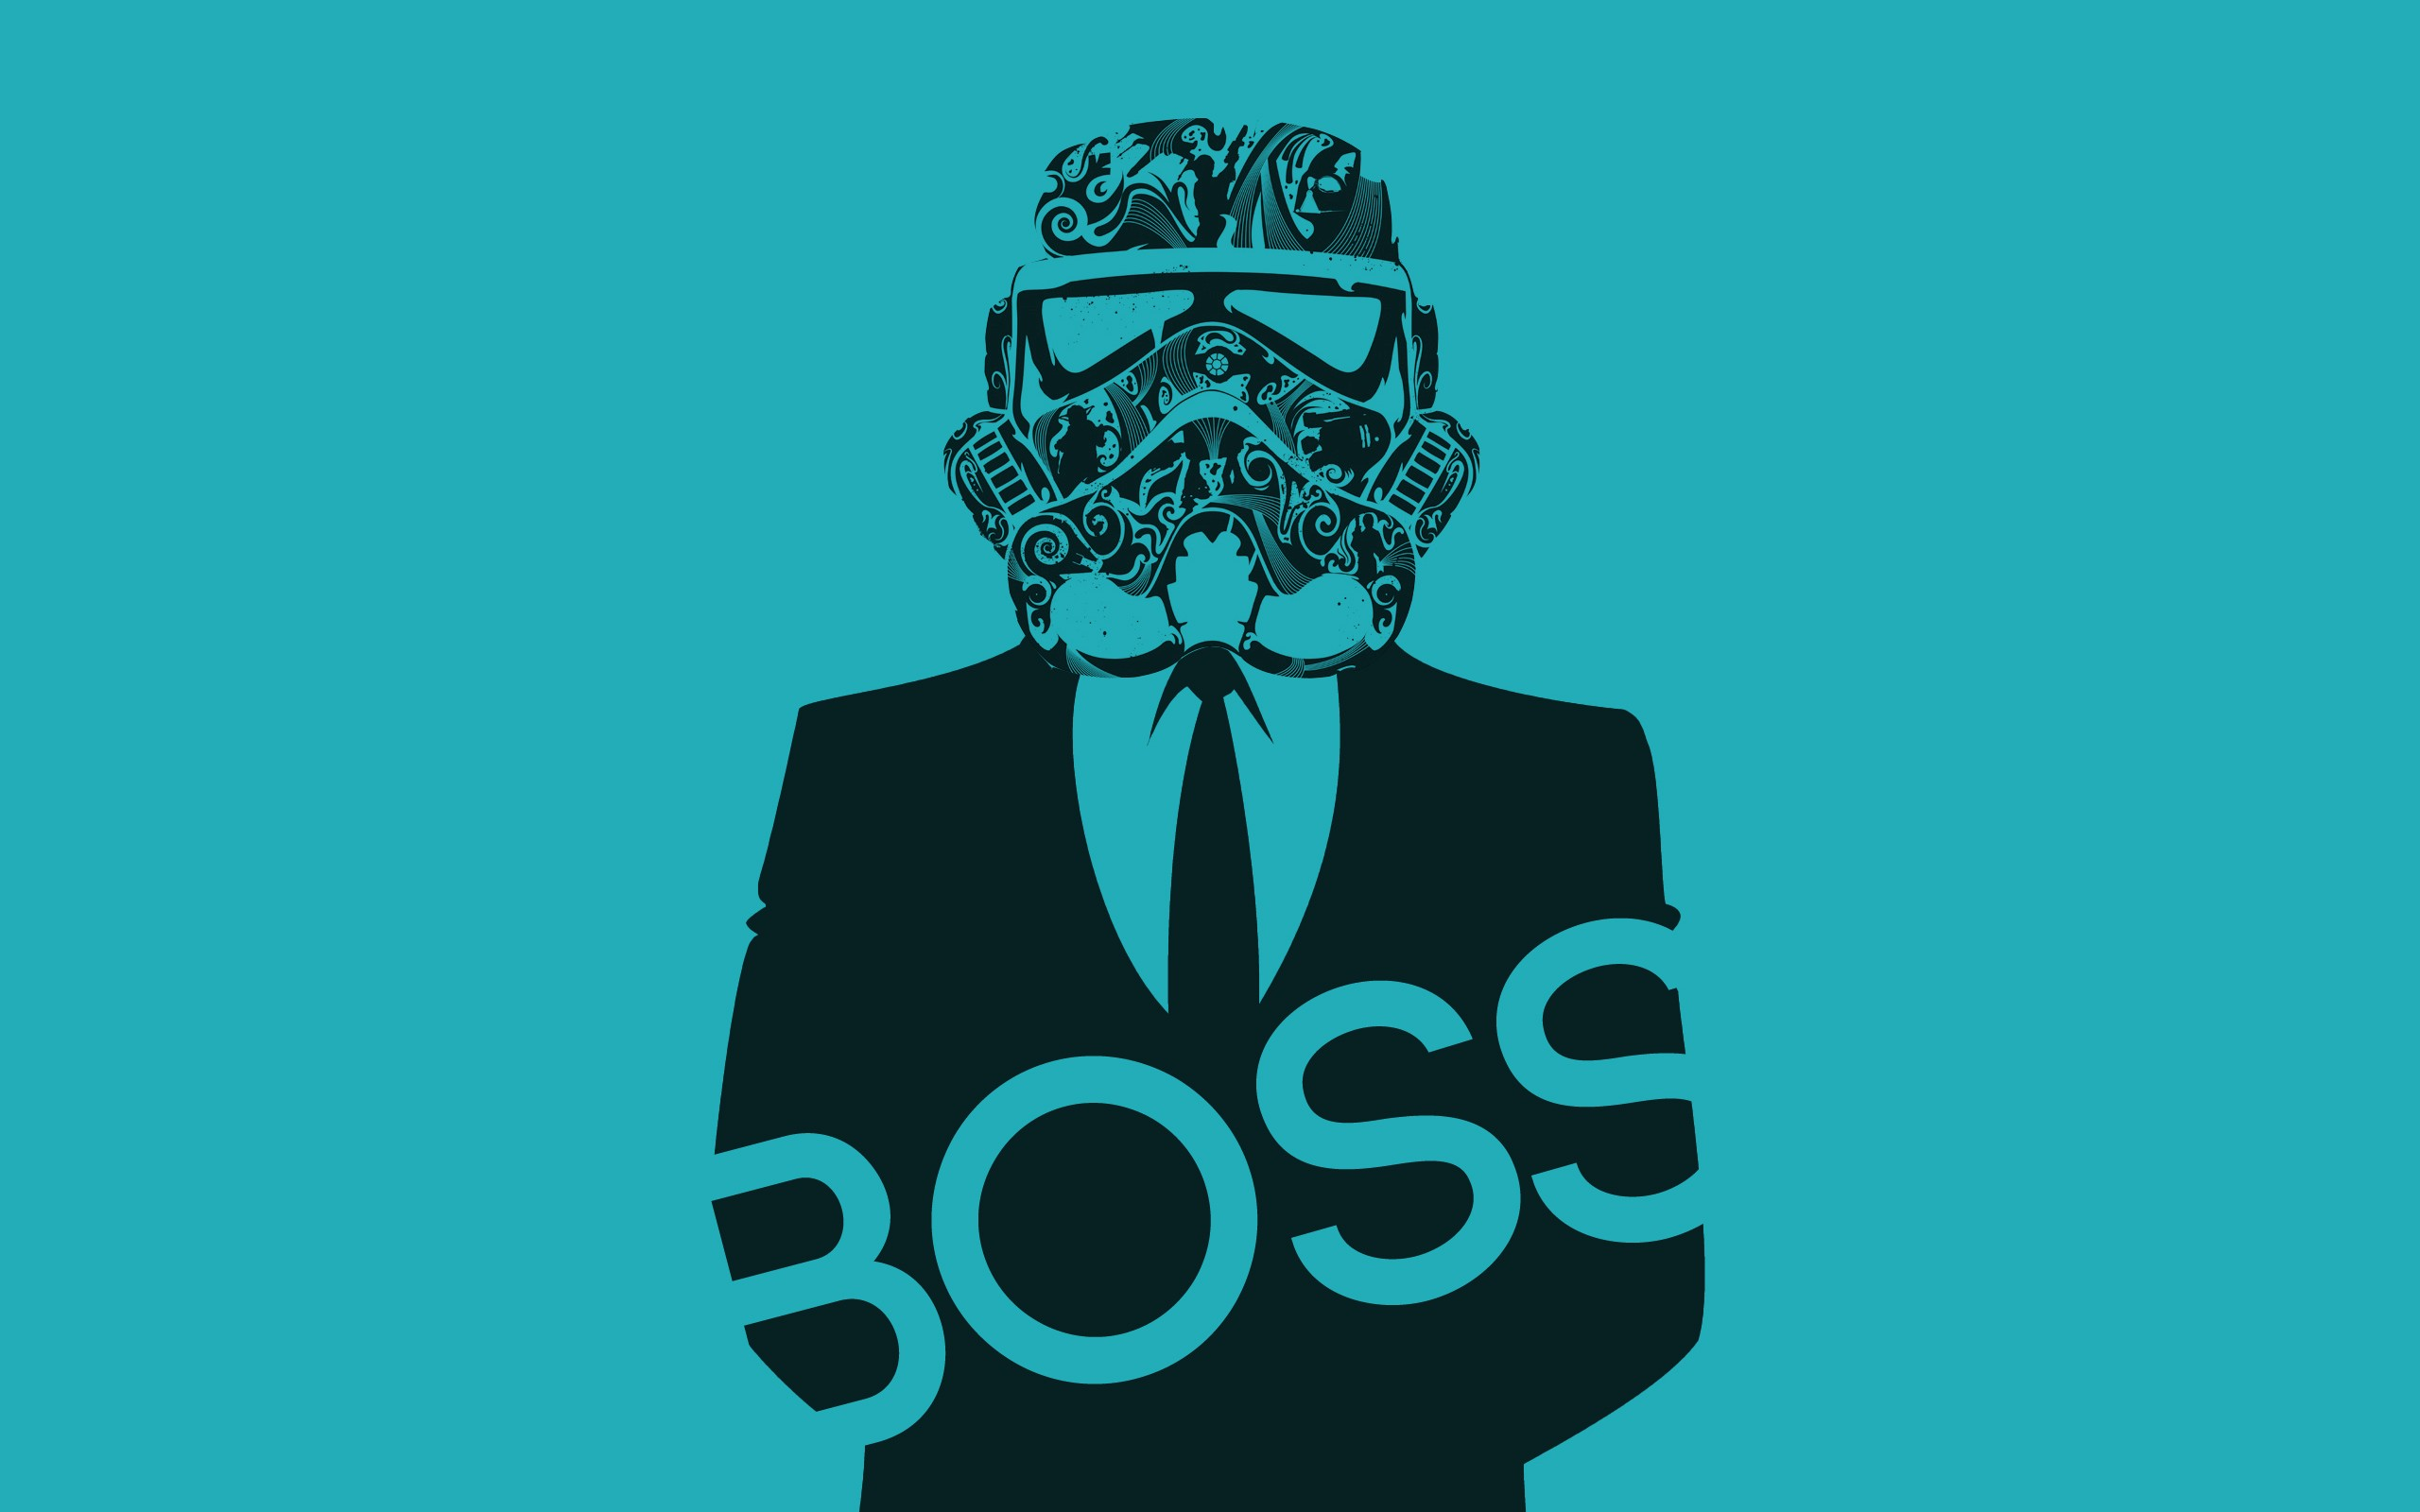 Star Wars boss Storm Trooper wallpaper background 2560x1600